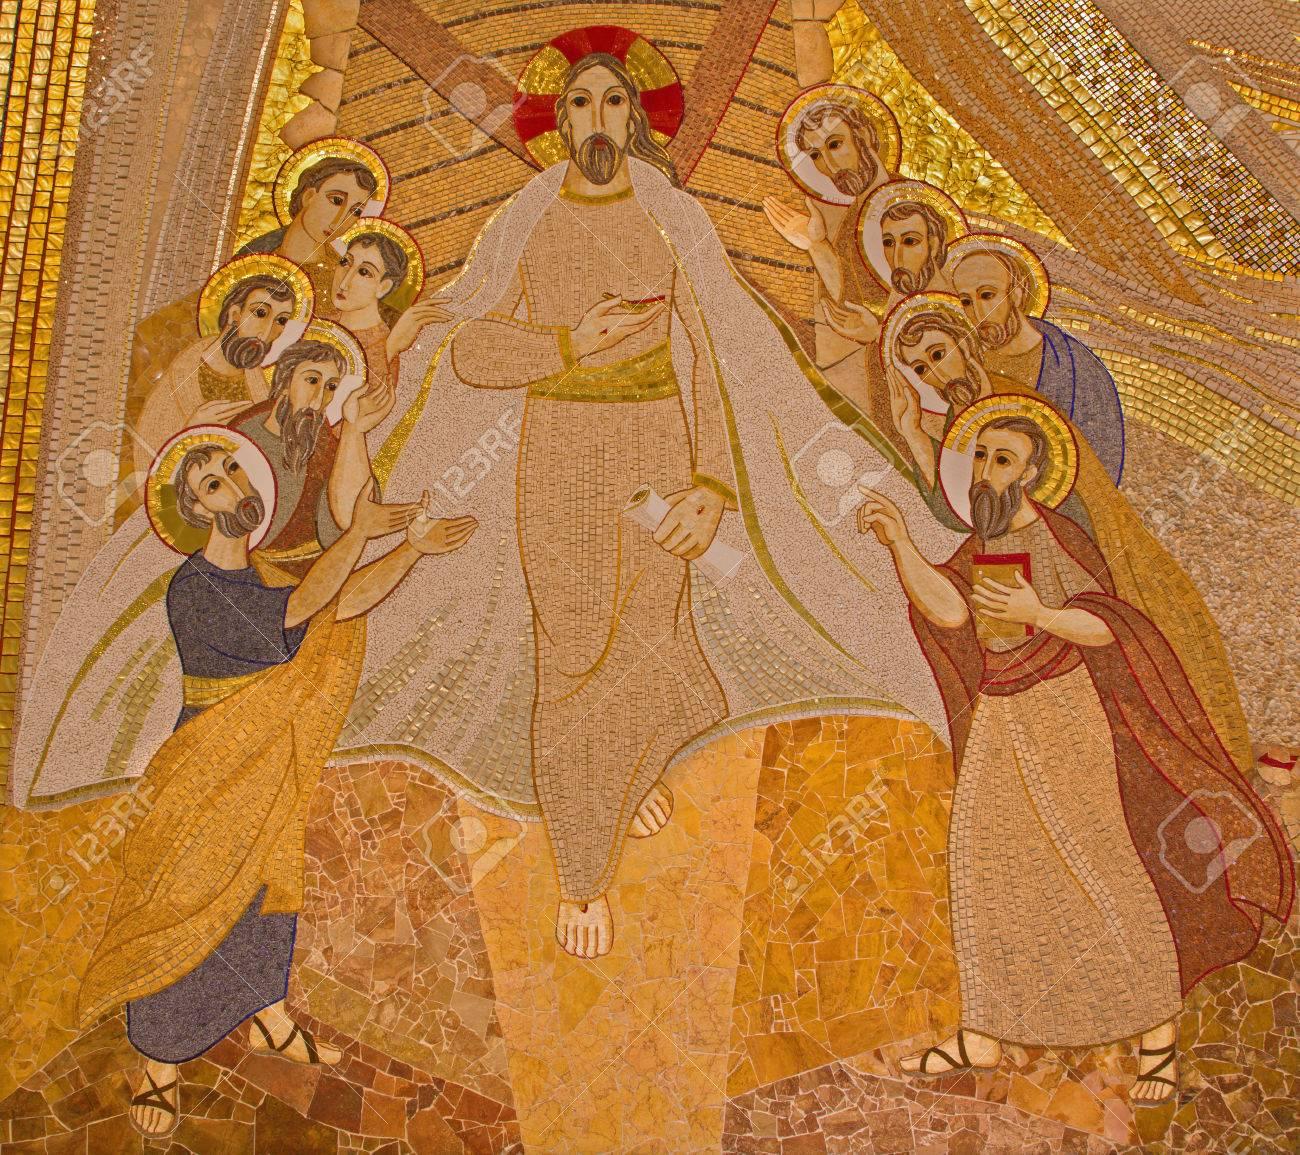 BRATISLAVA , SLOVAKIA - OCTOBER 1, 2014_ The mosaic of resurrected Christ among the apostles in the Saint Sebastian cathedral designed by jesuit Mar?ko Ivan Rupnik (2011). - 32477658